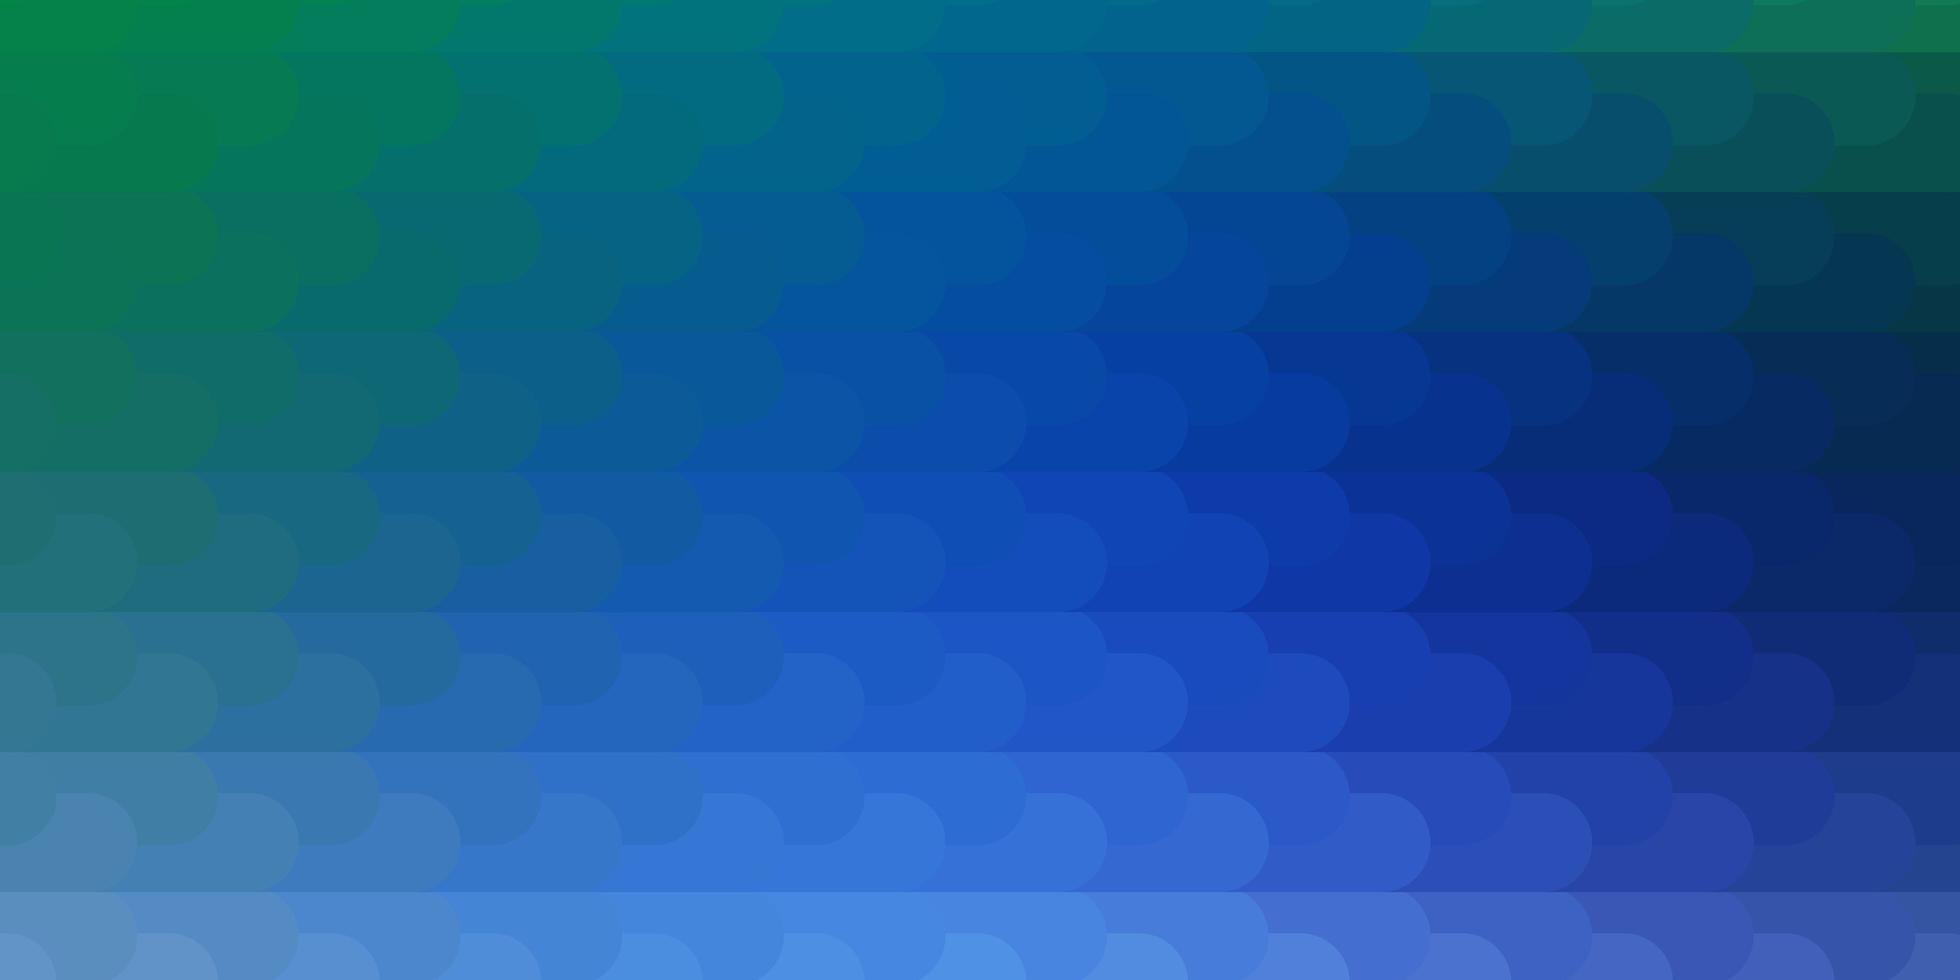 diseño de vector azul claro, verde con líneas.